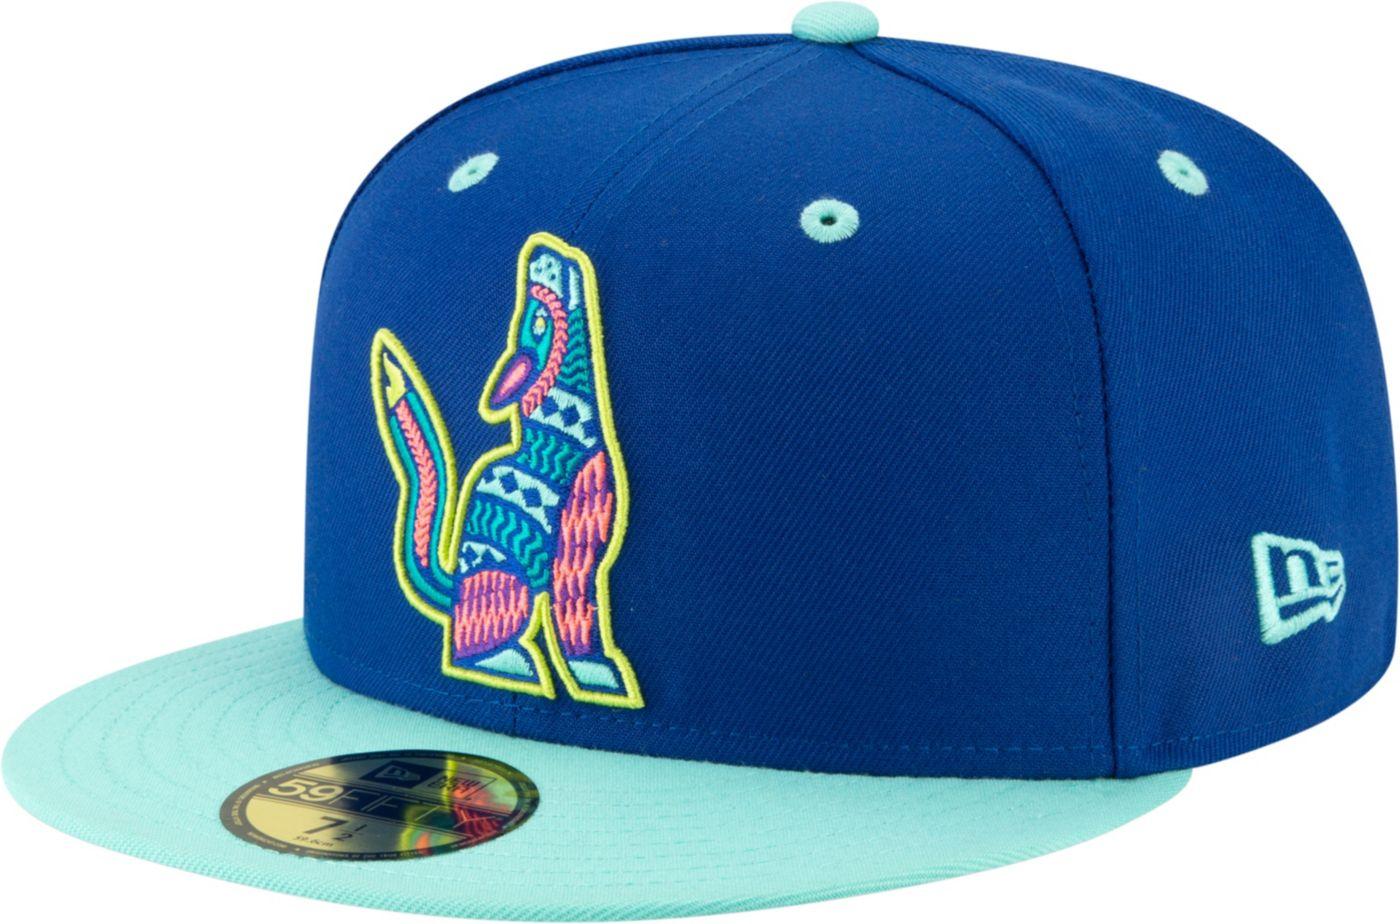 New Era Men's Hillsboro Hops 59Fifty 2019 COPA Authentic Hat